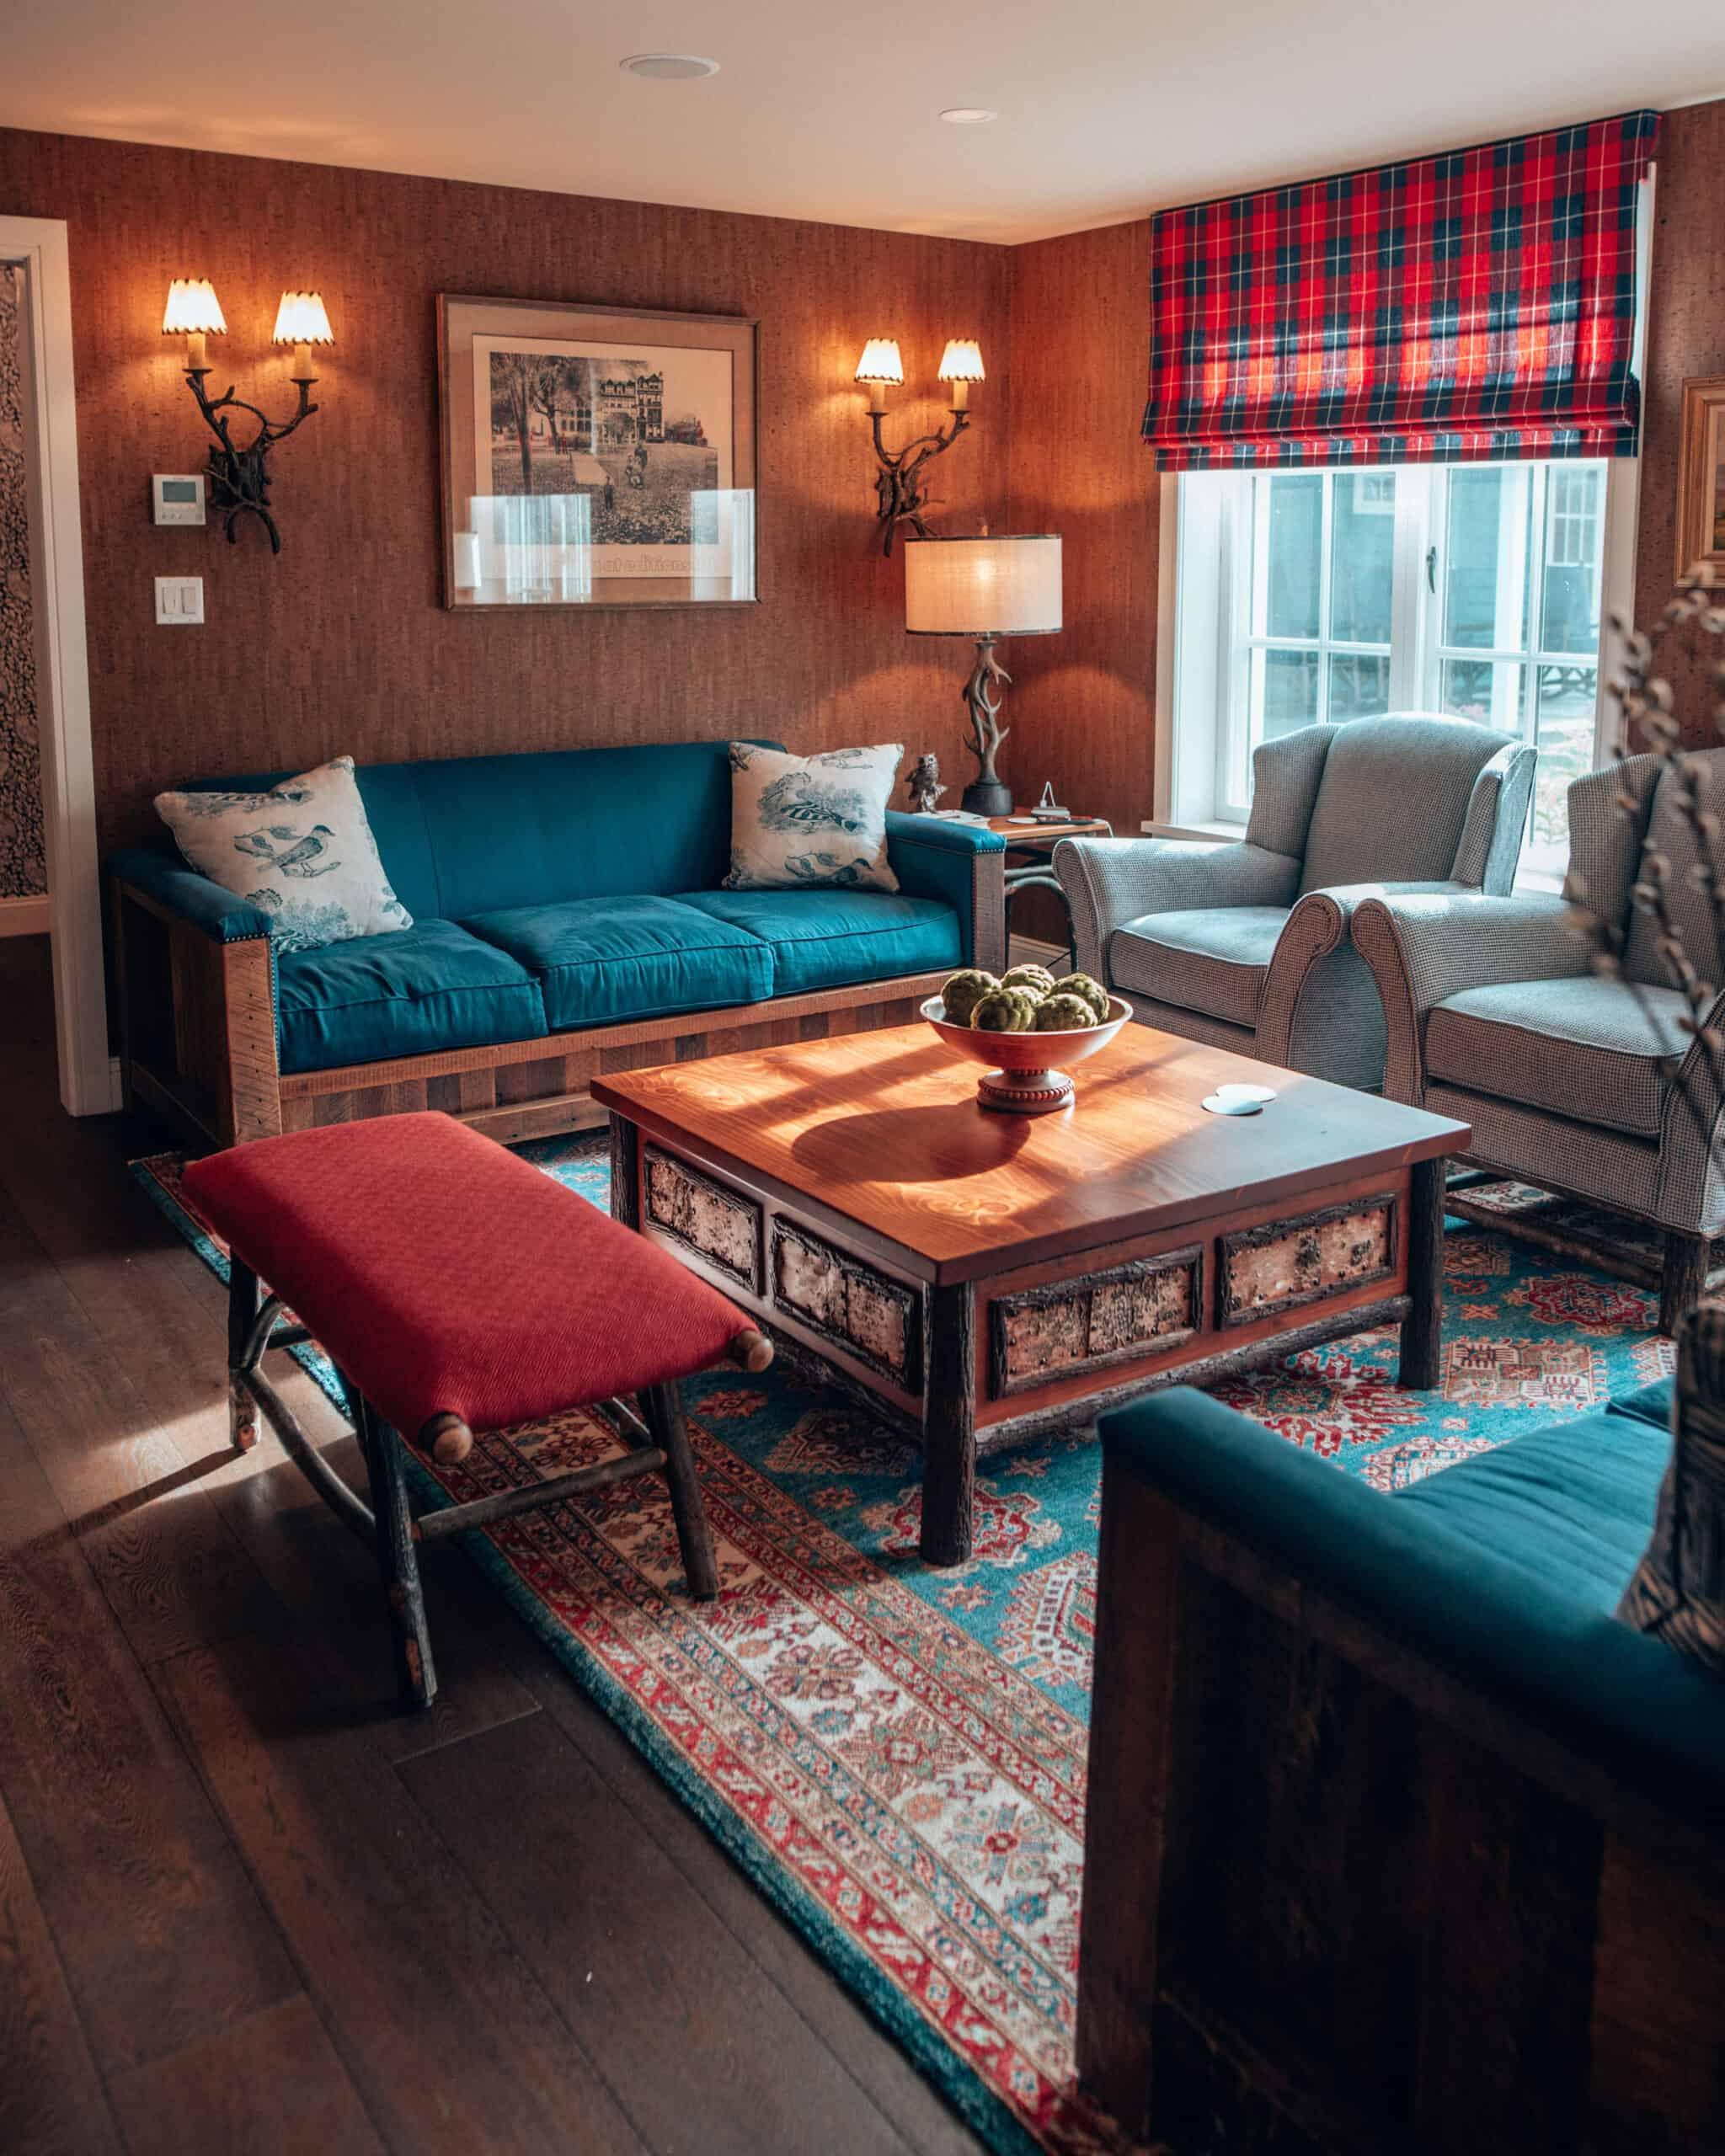 Hotels in Upstate NY